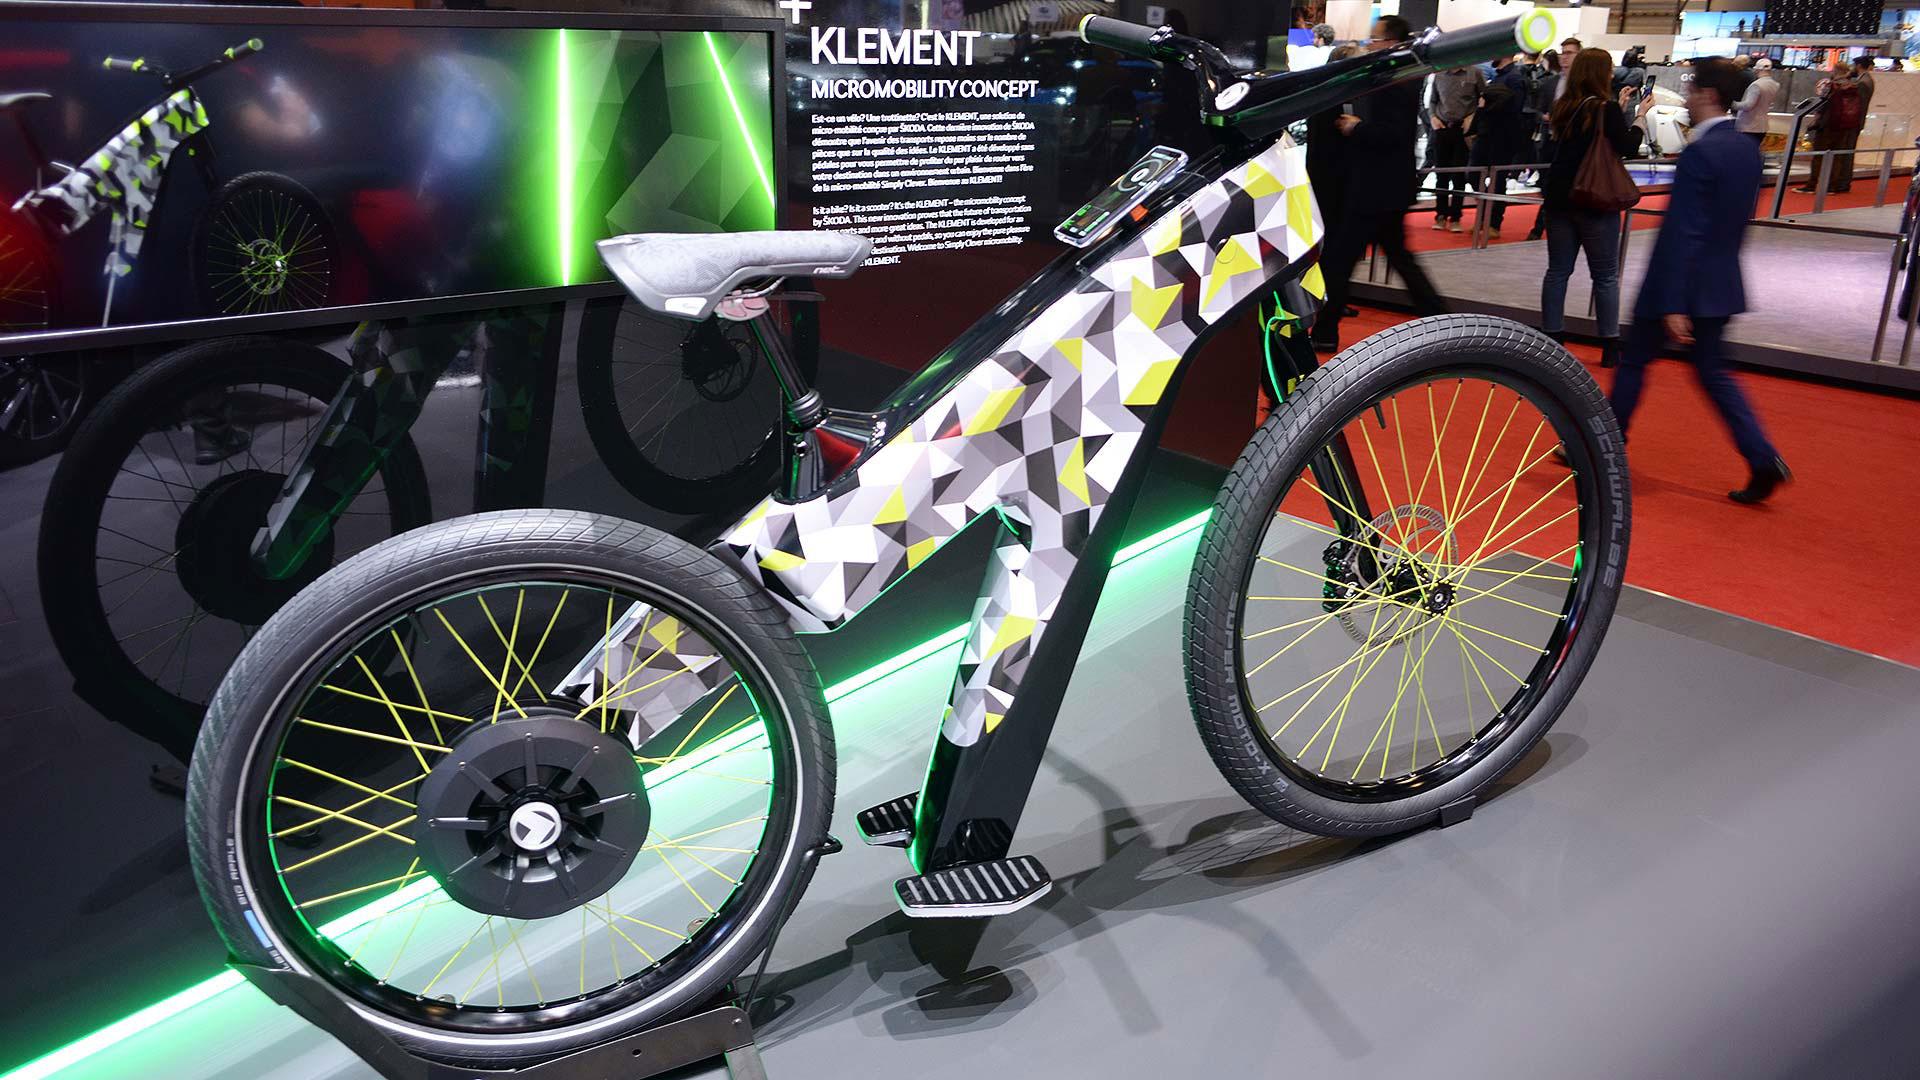 Skoda Klement electric bike